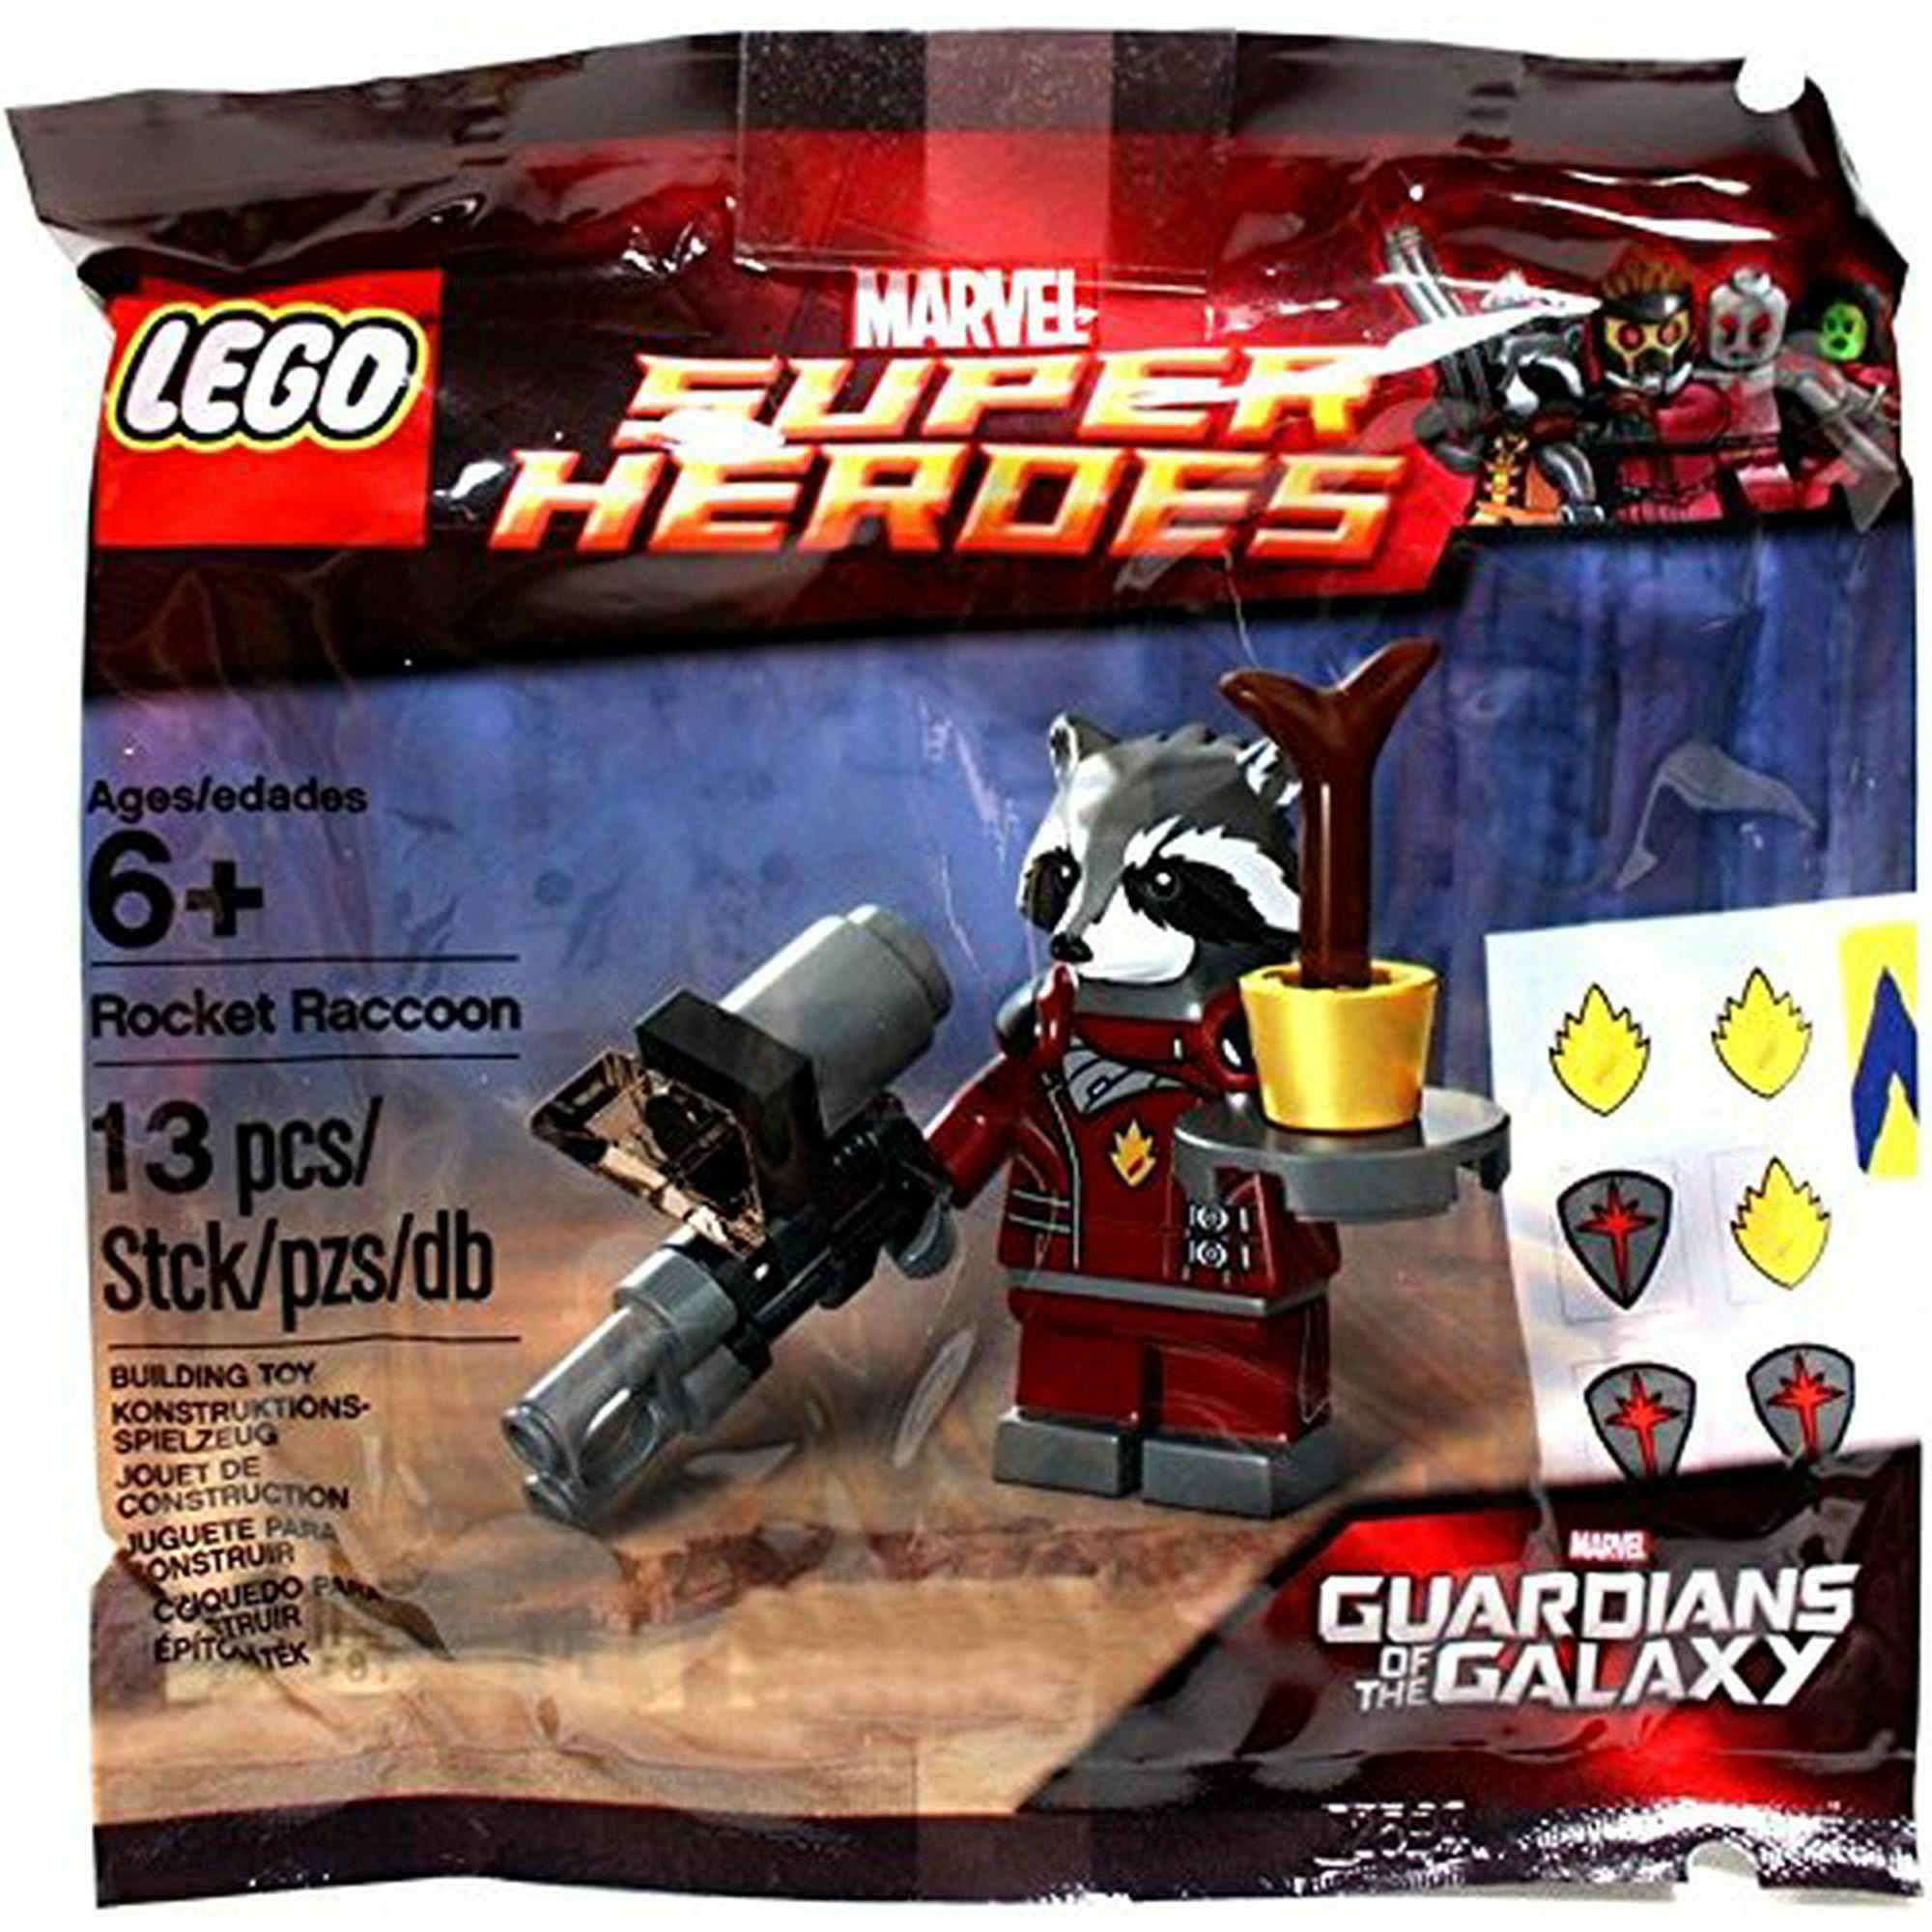 Lego Guardians of the Galaxy ROCKET RACCOON Minifigure sh122 FAST SHIPPING!